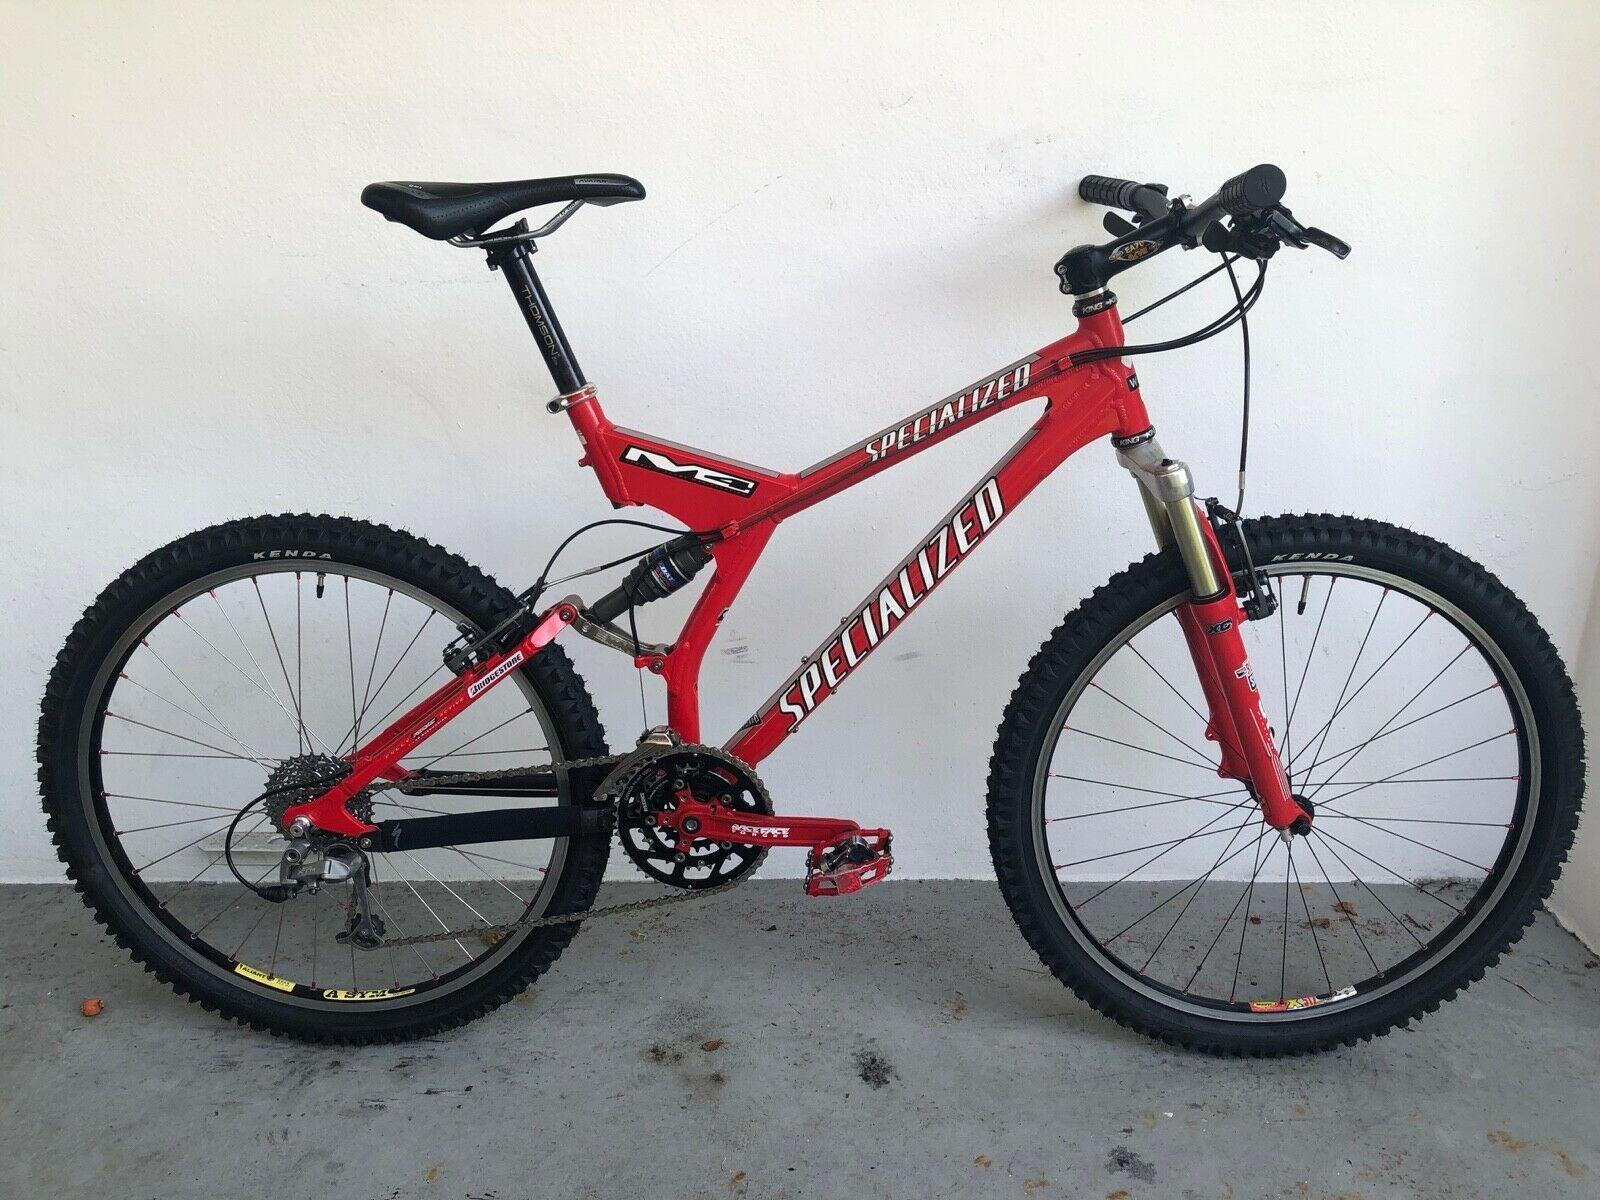 2000 Specialized S Works Fsr Xc Full Suspension Mountain Bike